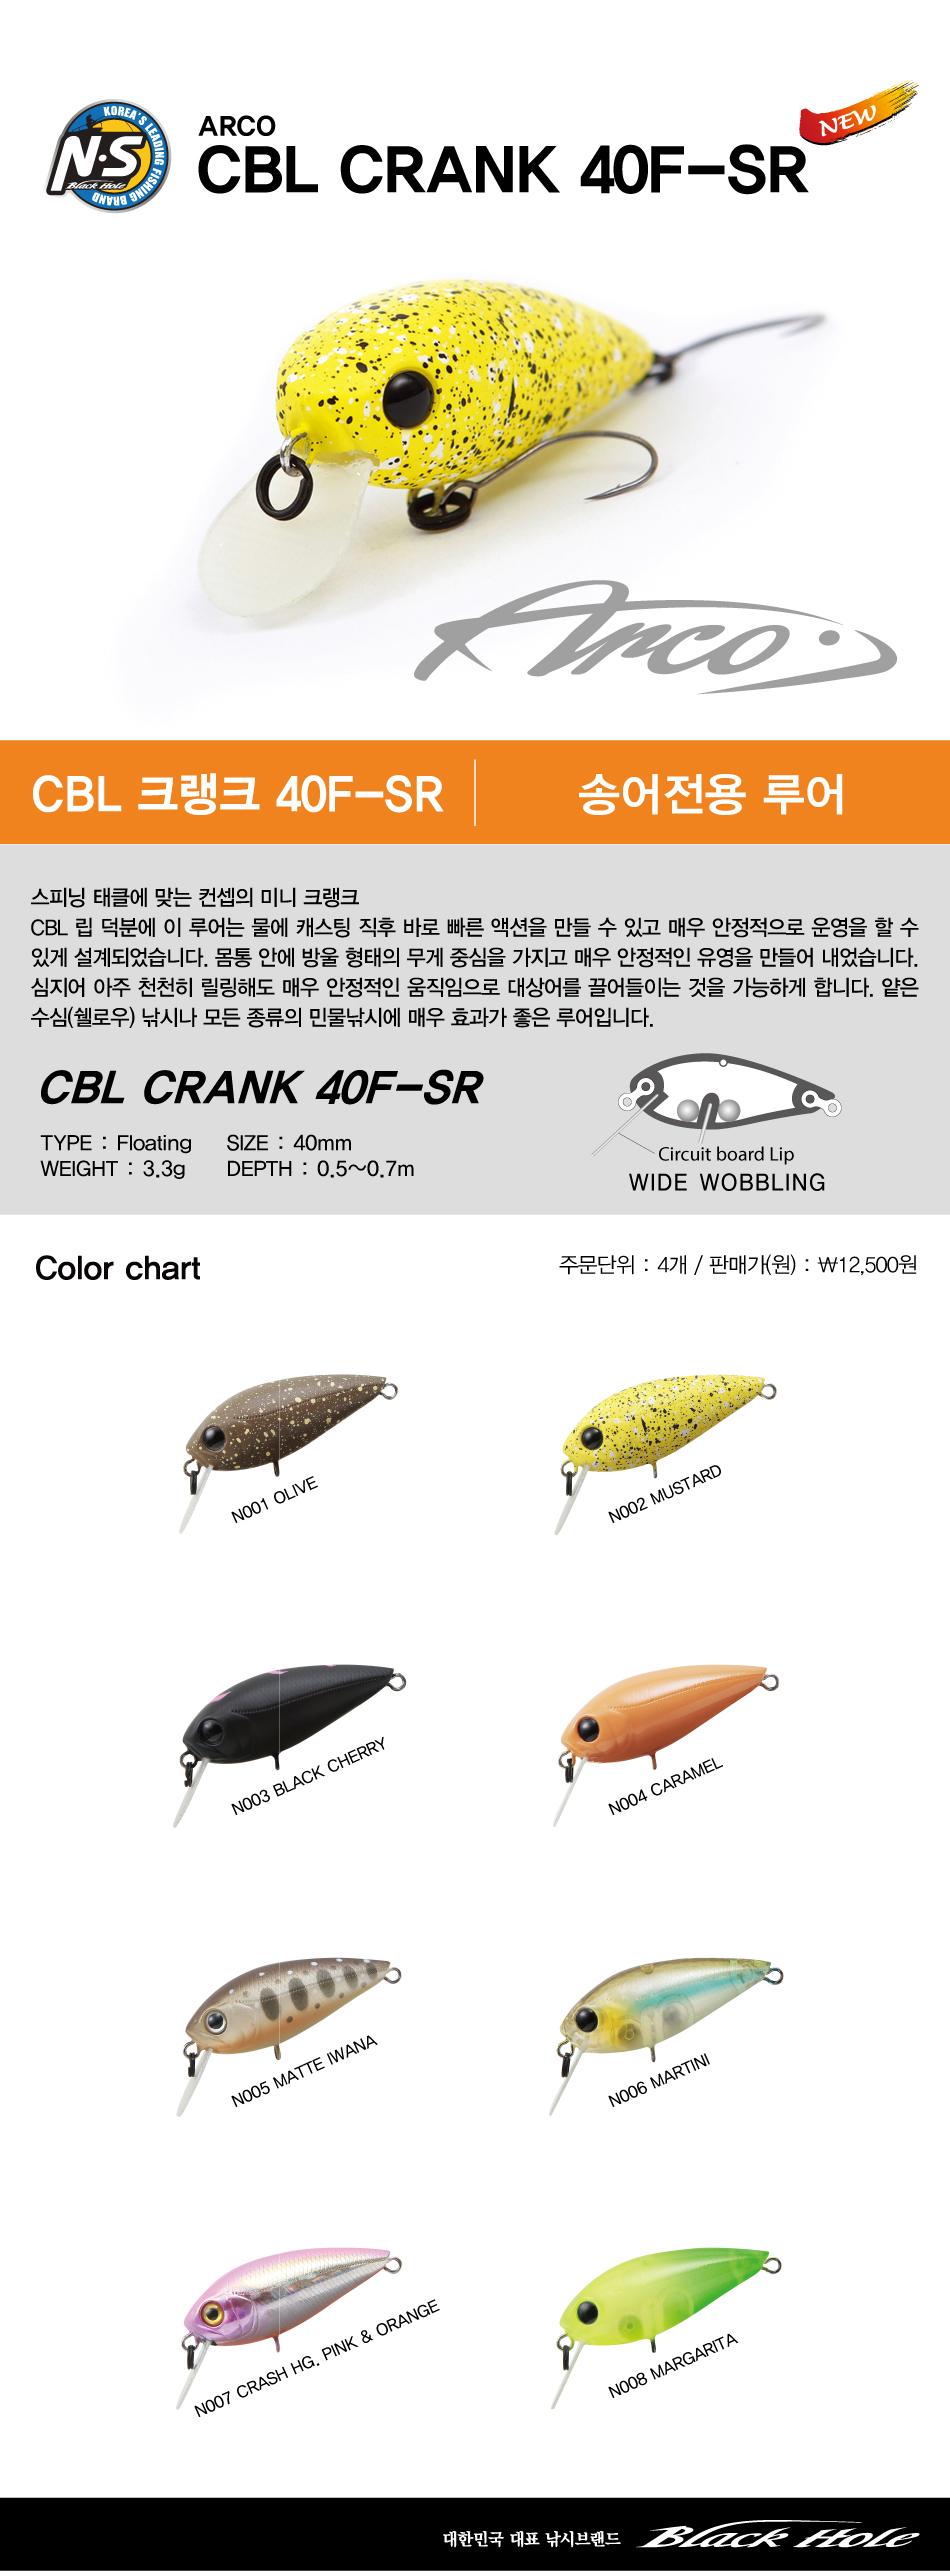 NS 아르코 CBL 크랭크 40F-SR(송어전용)  NS 아르코 CBL 크랭크 40F-SR(송어전용) 송어루어 송어낚시 송어